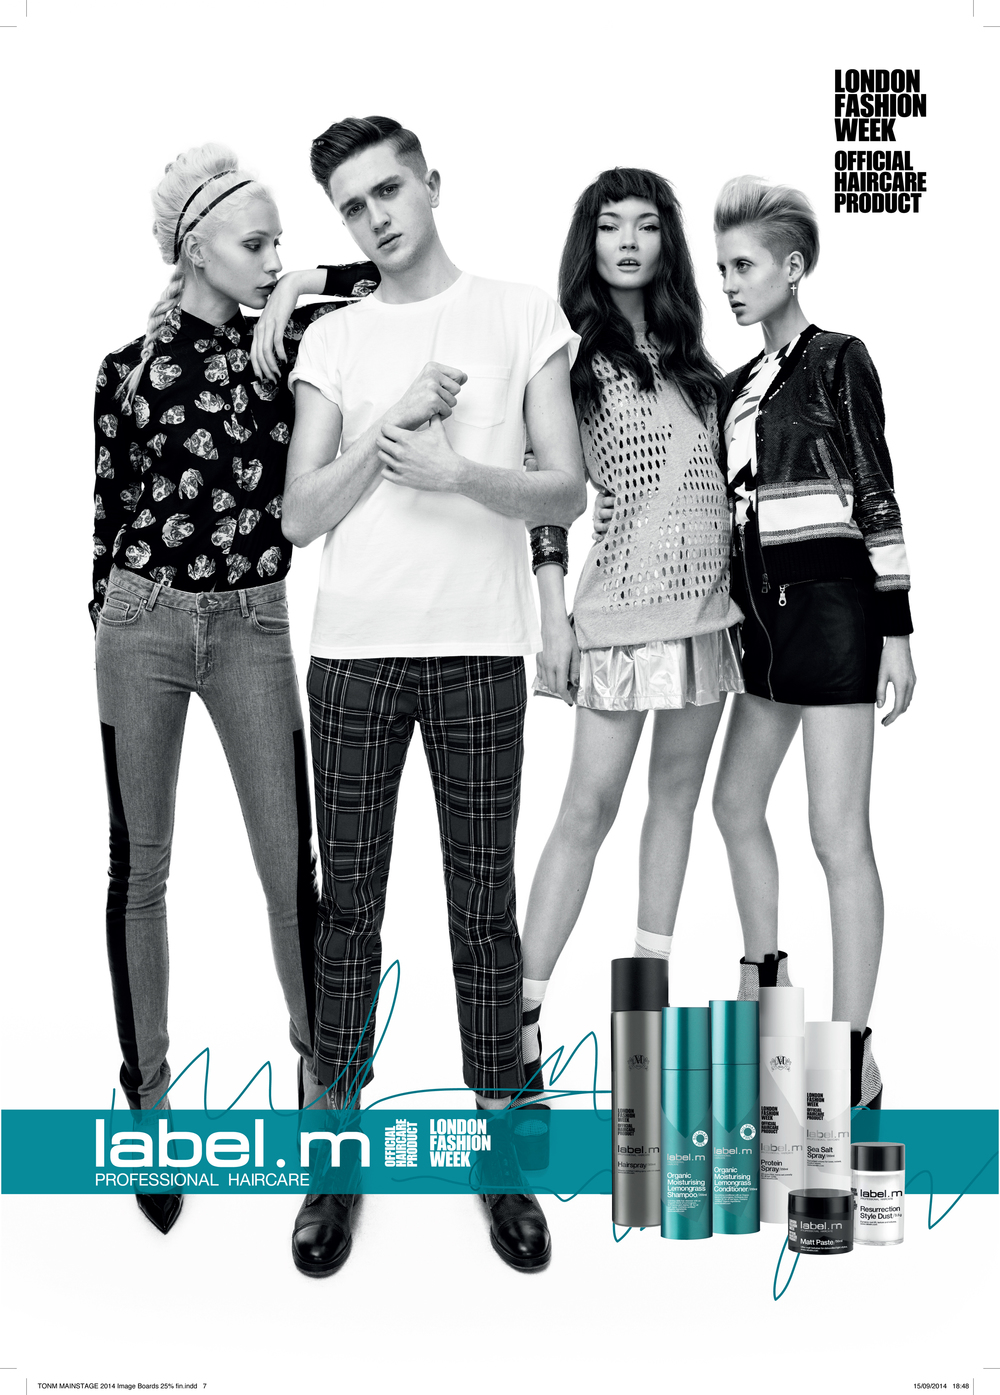 Labelm - Toni & Guy